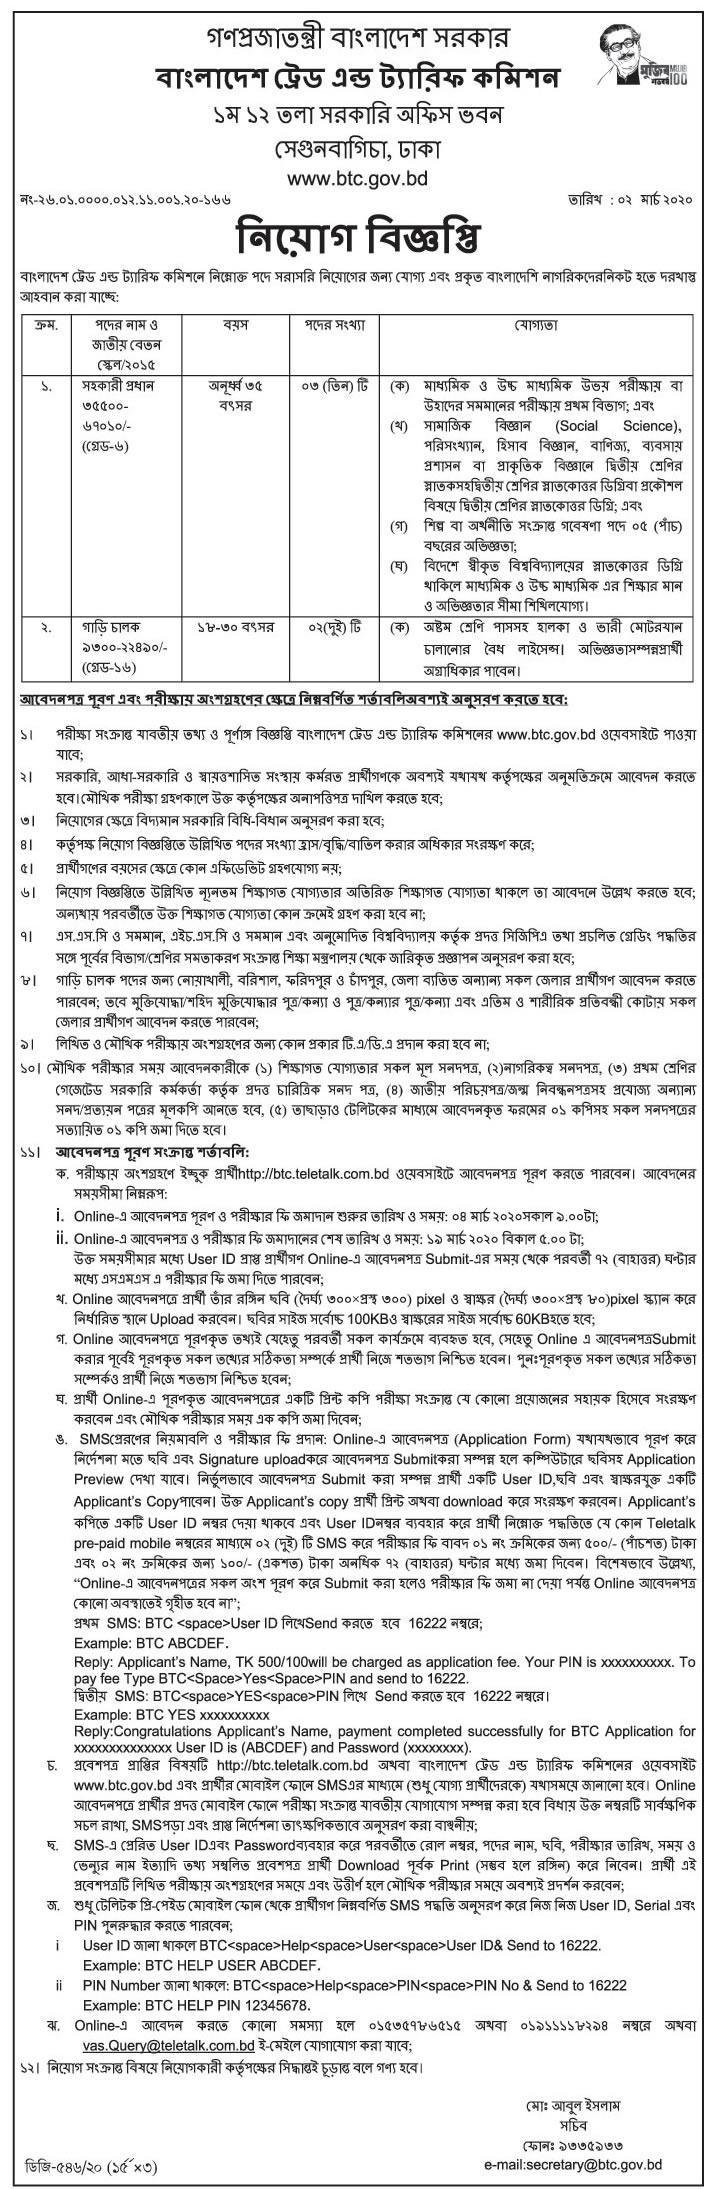 BTC Job Circular 2020 - btc.gov.bdBTC Job Circular 2020 - btc.gov.bd